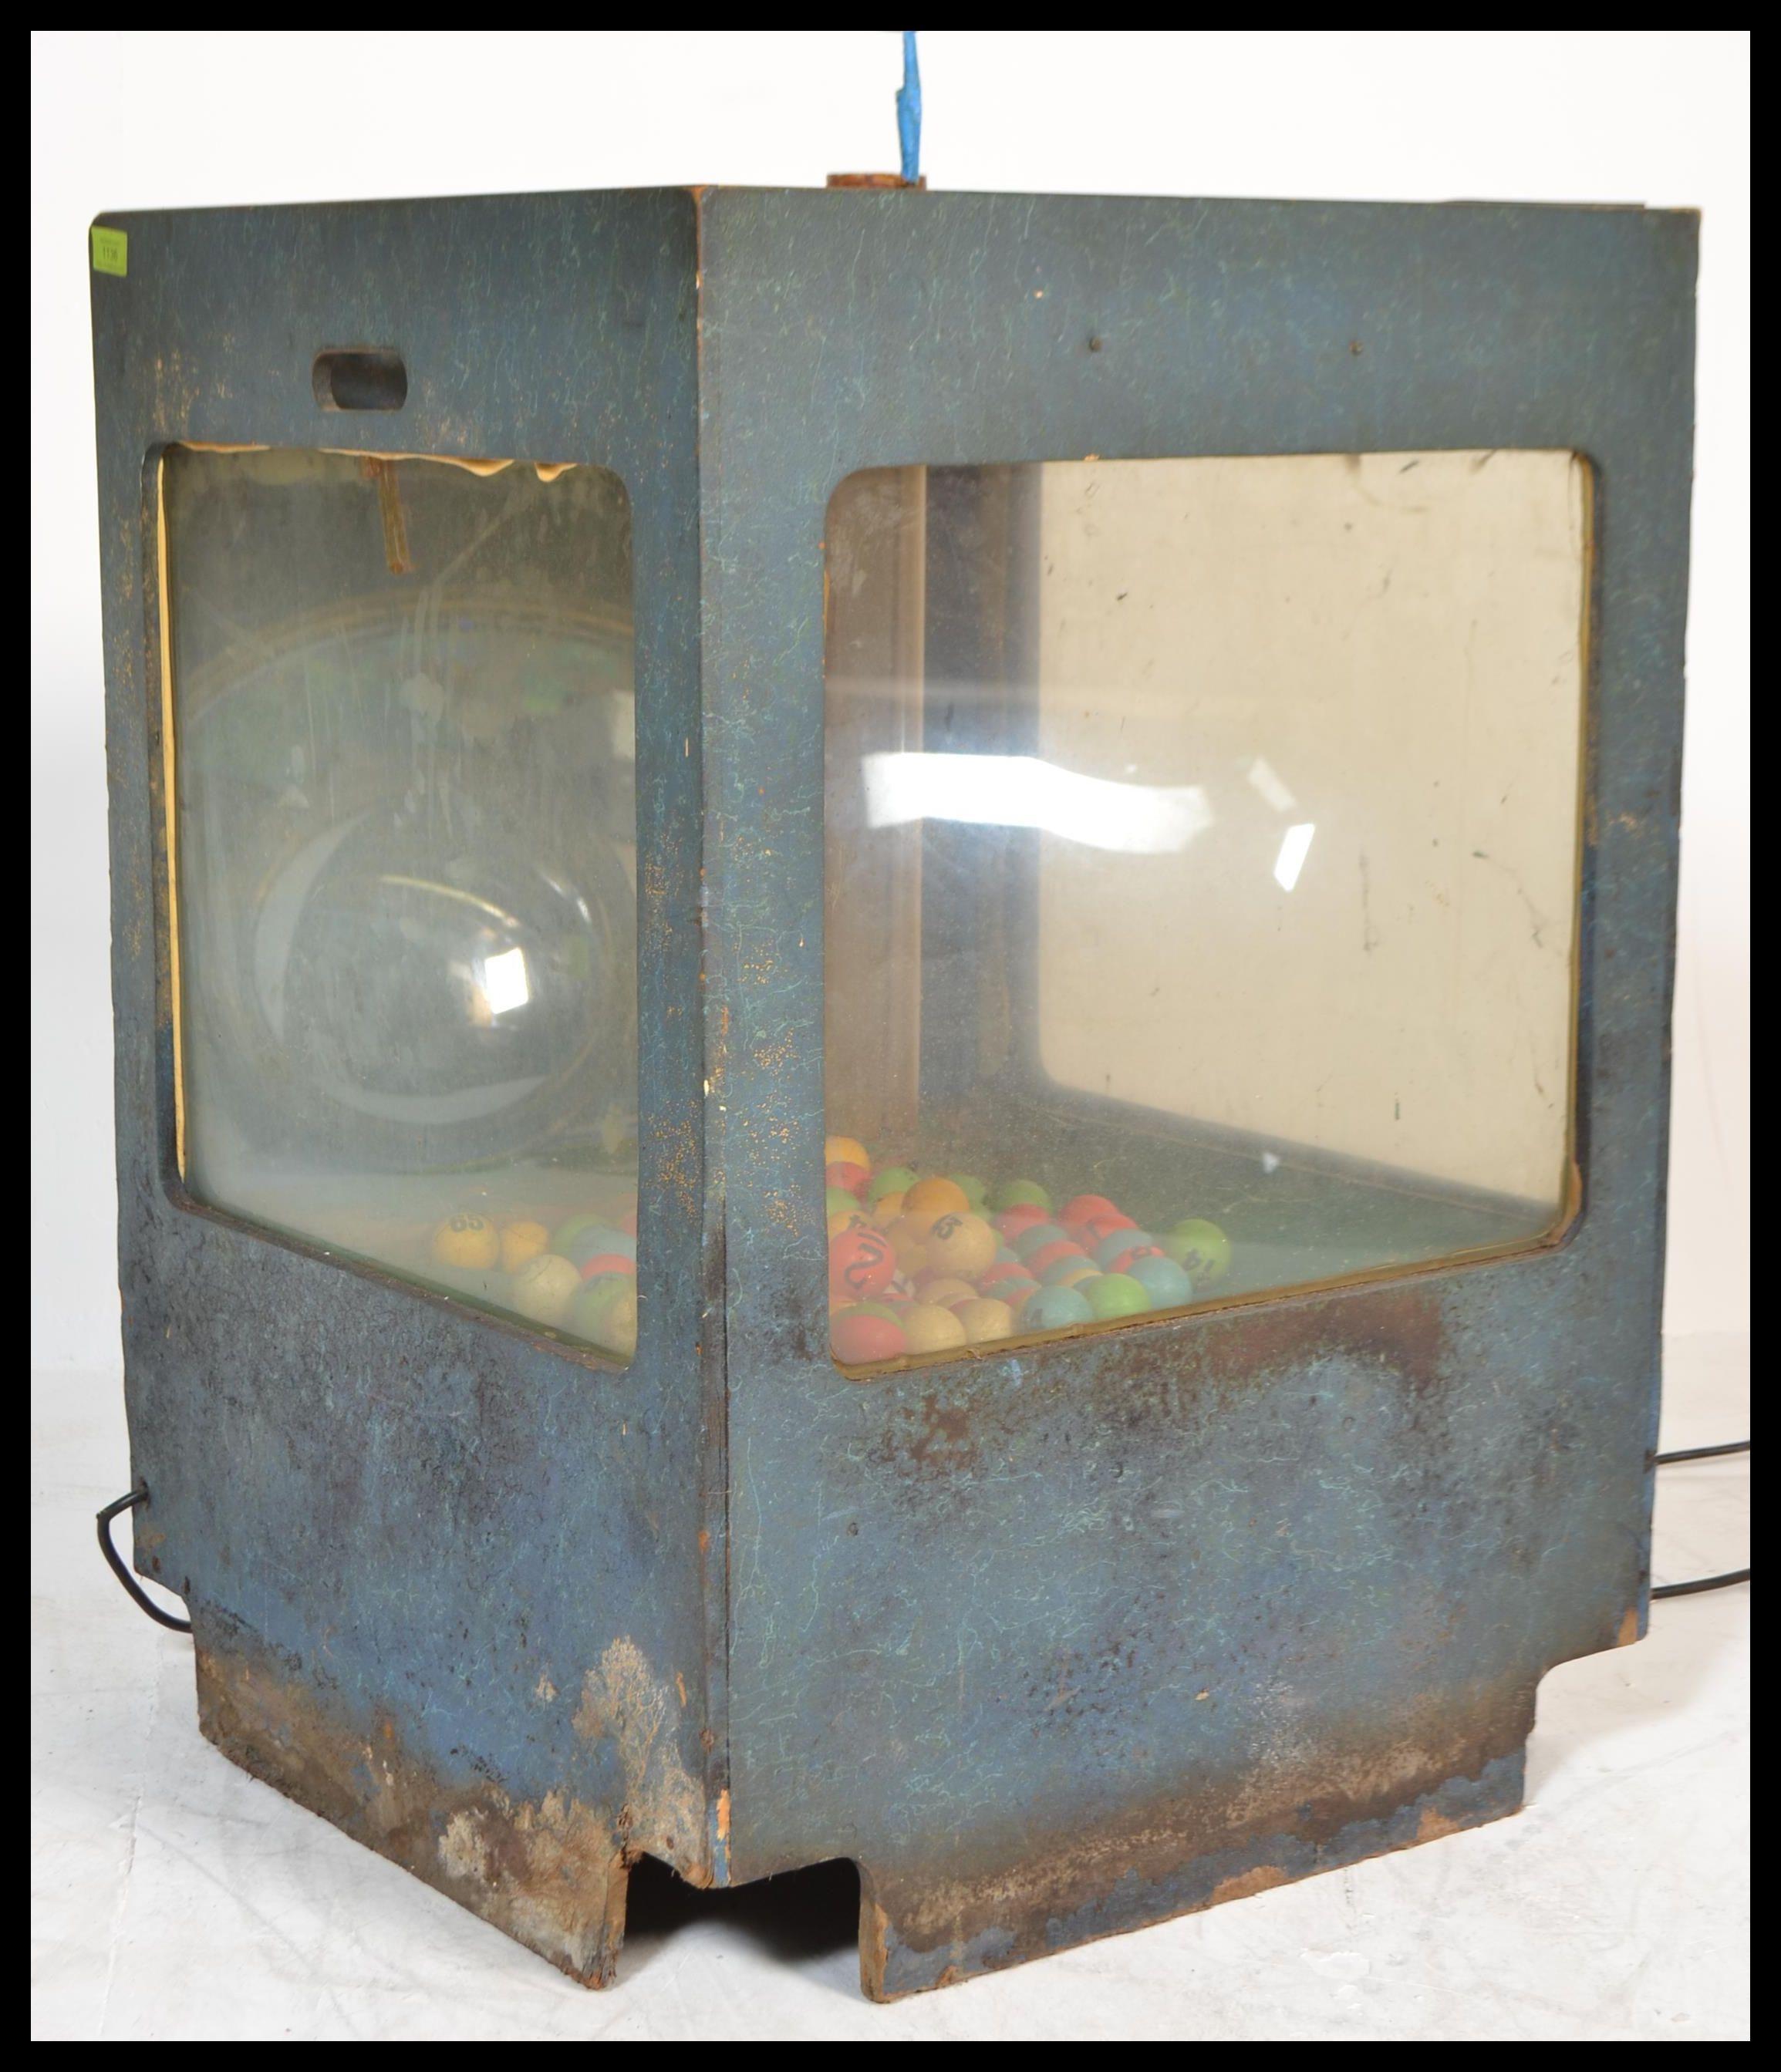 A vintage retro 20th century bingo tombola lottery machine having a